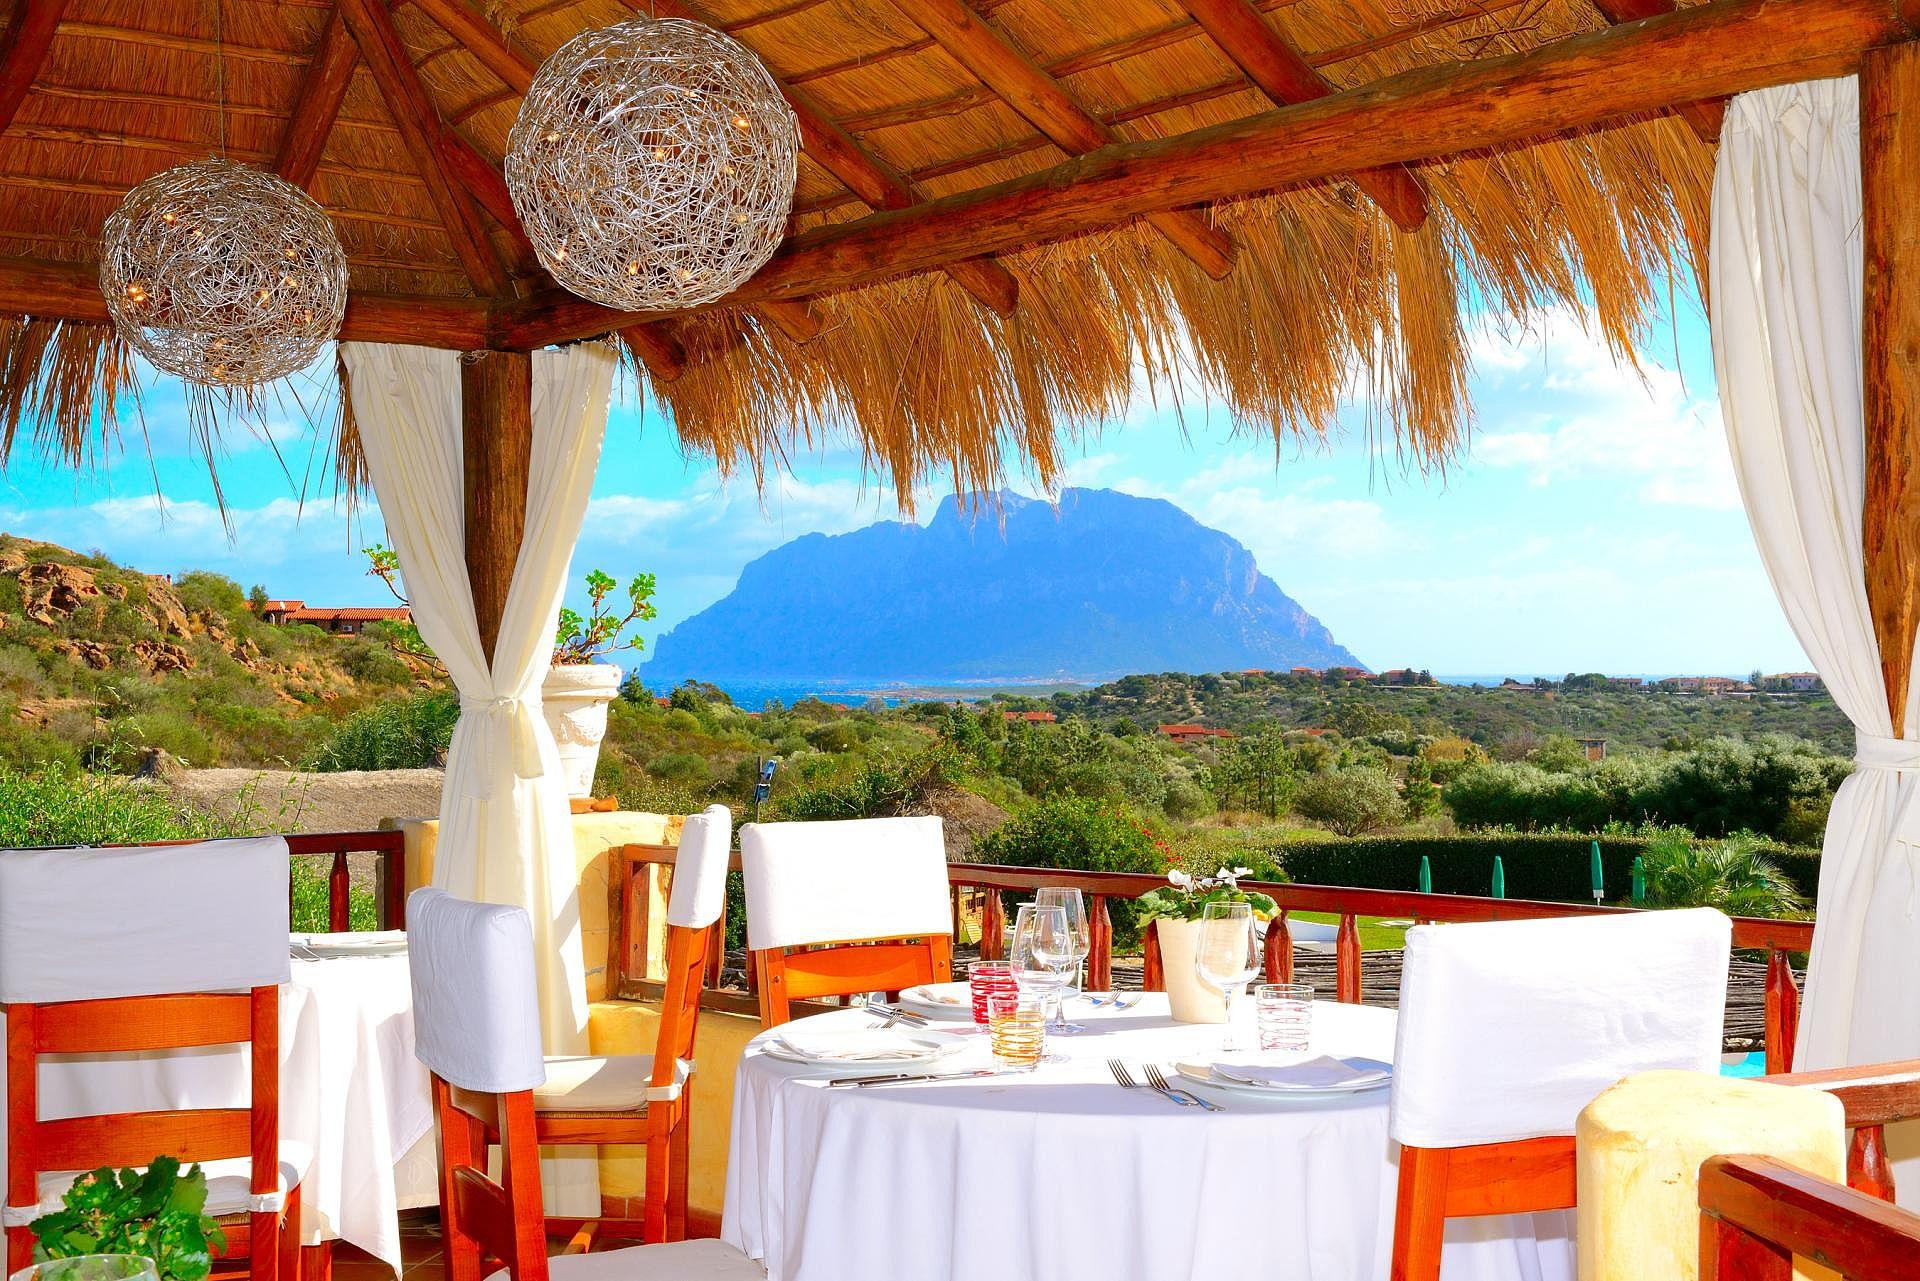 http://extranet.jetlinetravel.info/express-images/express_costa_corallina_sardinia_2.jpg